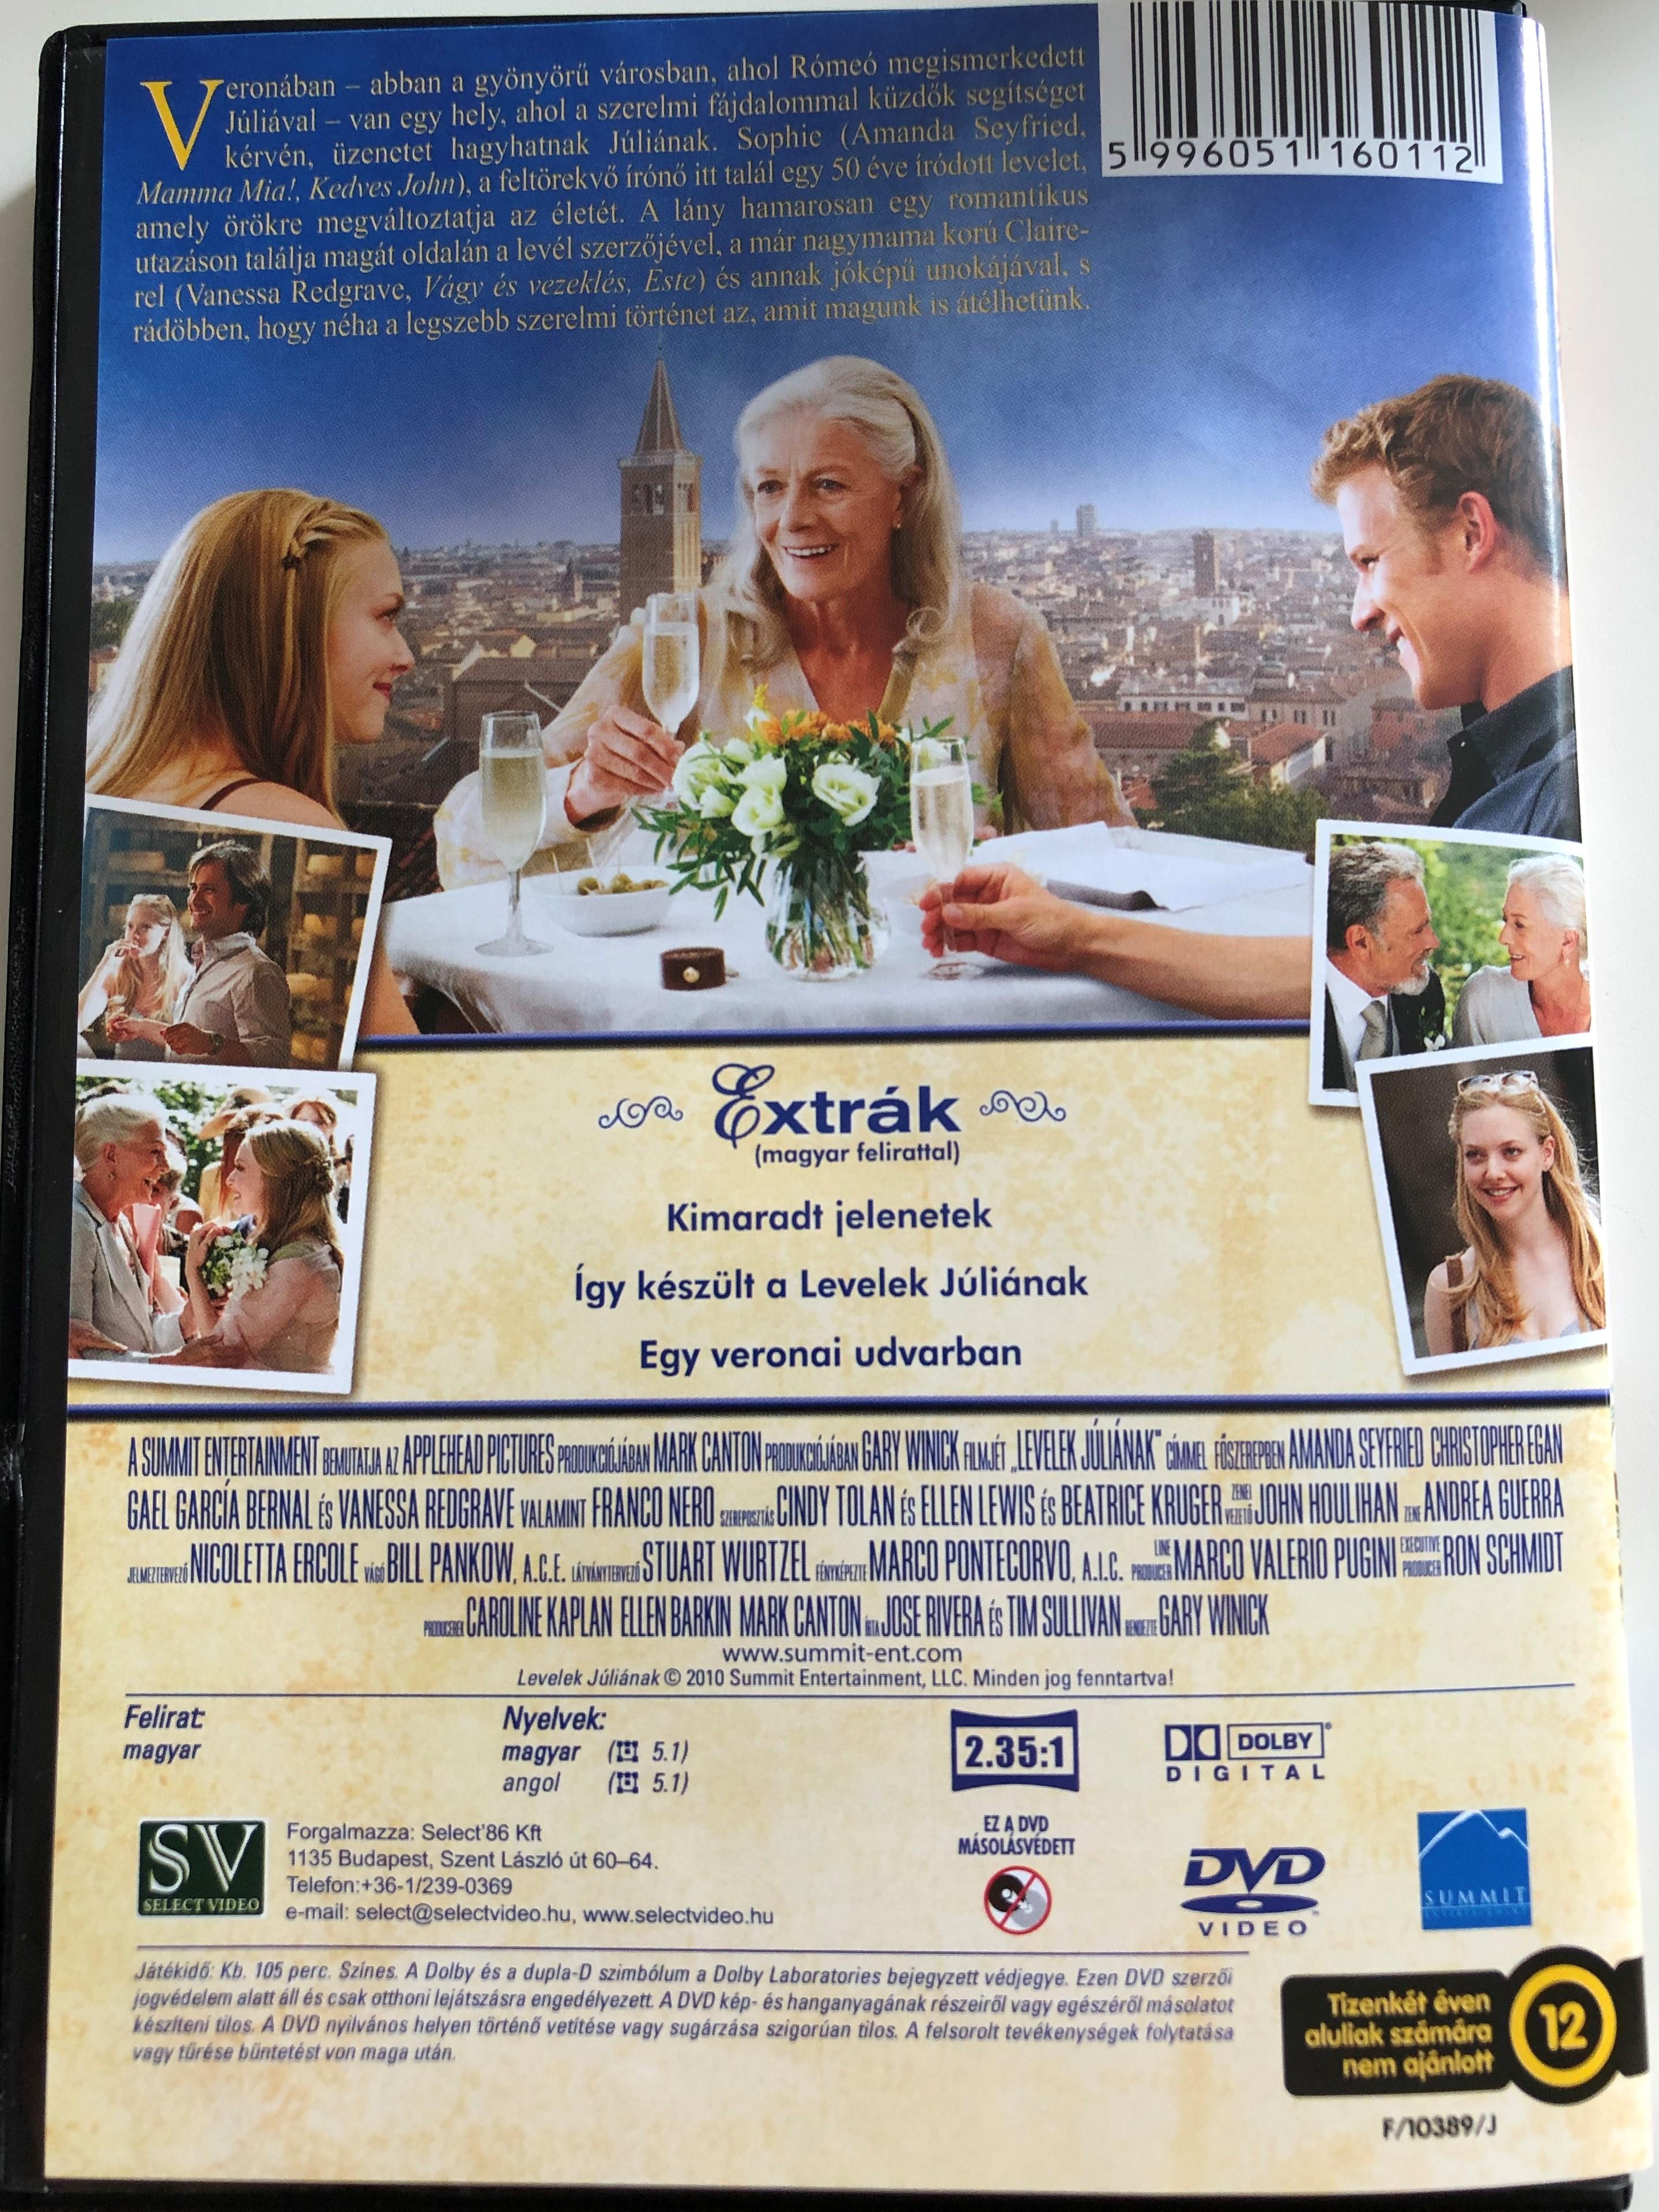 letters-to-juliet-dvd-2010-levelek-j-li-nak-directed-by-gary-winick-starring-a-amda-seyfried-christopher-egan-gael-garc-a-bernal-vanessa-redgrave-2-.jpg